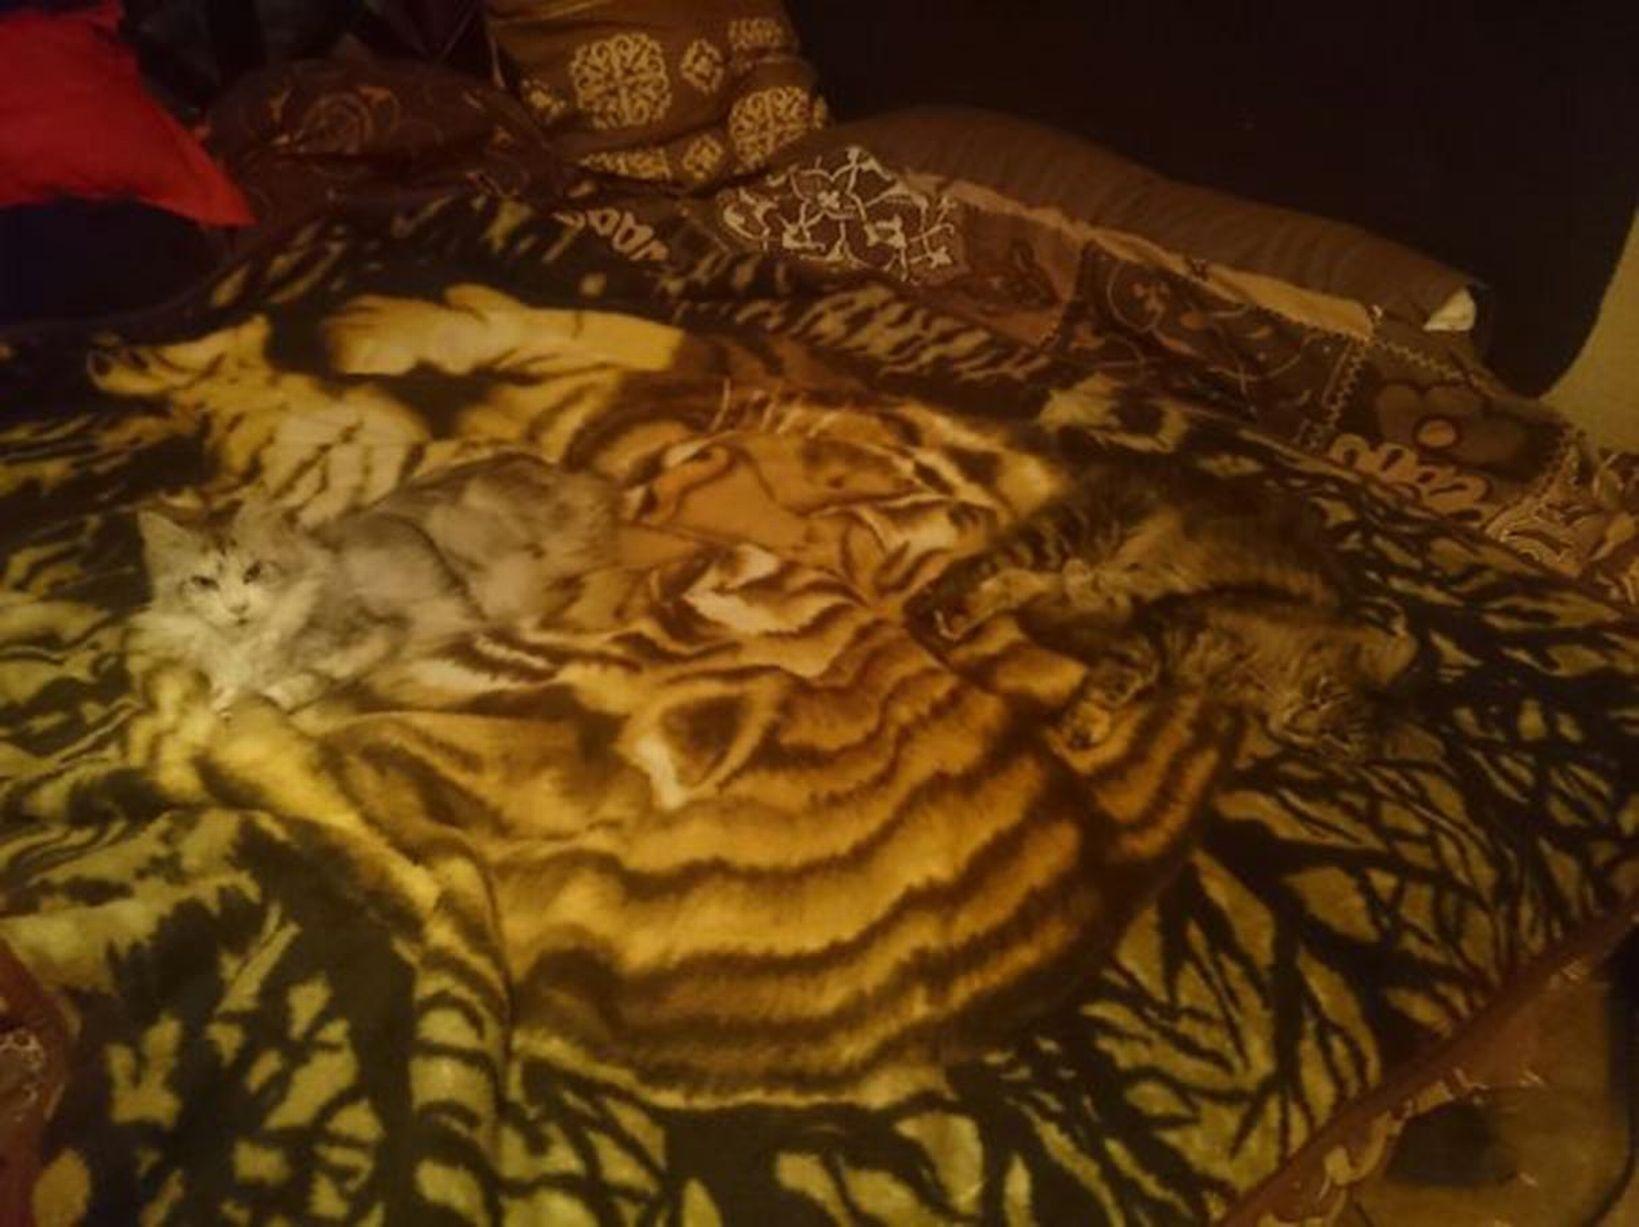 kamuflase kucing13 - 13 Aksi Kamuflase Kucing Yang Menggemaskan. Kamu Bisa Melihatnya ?